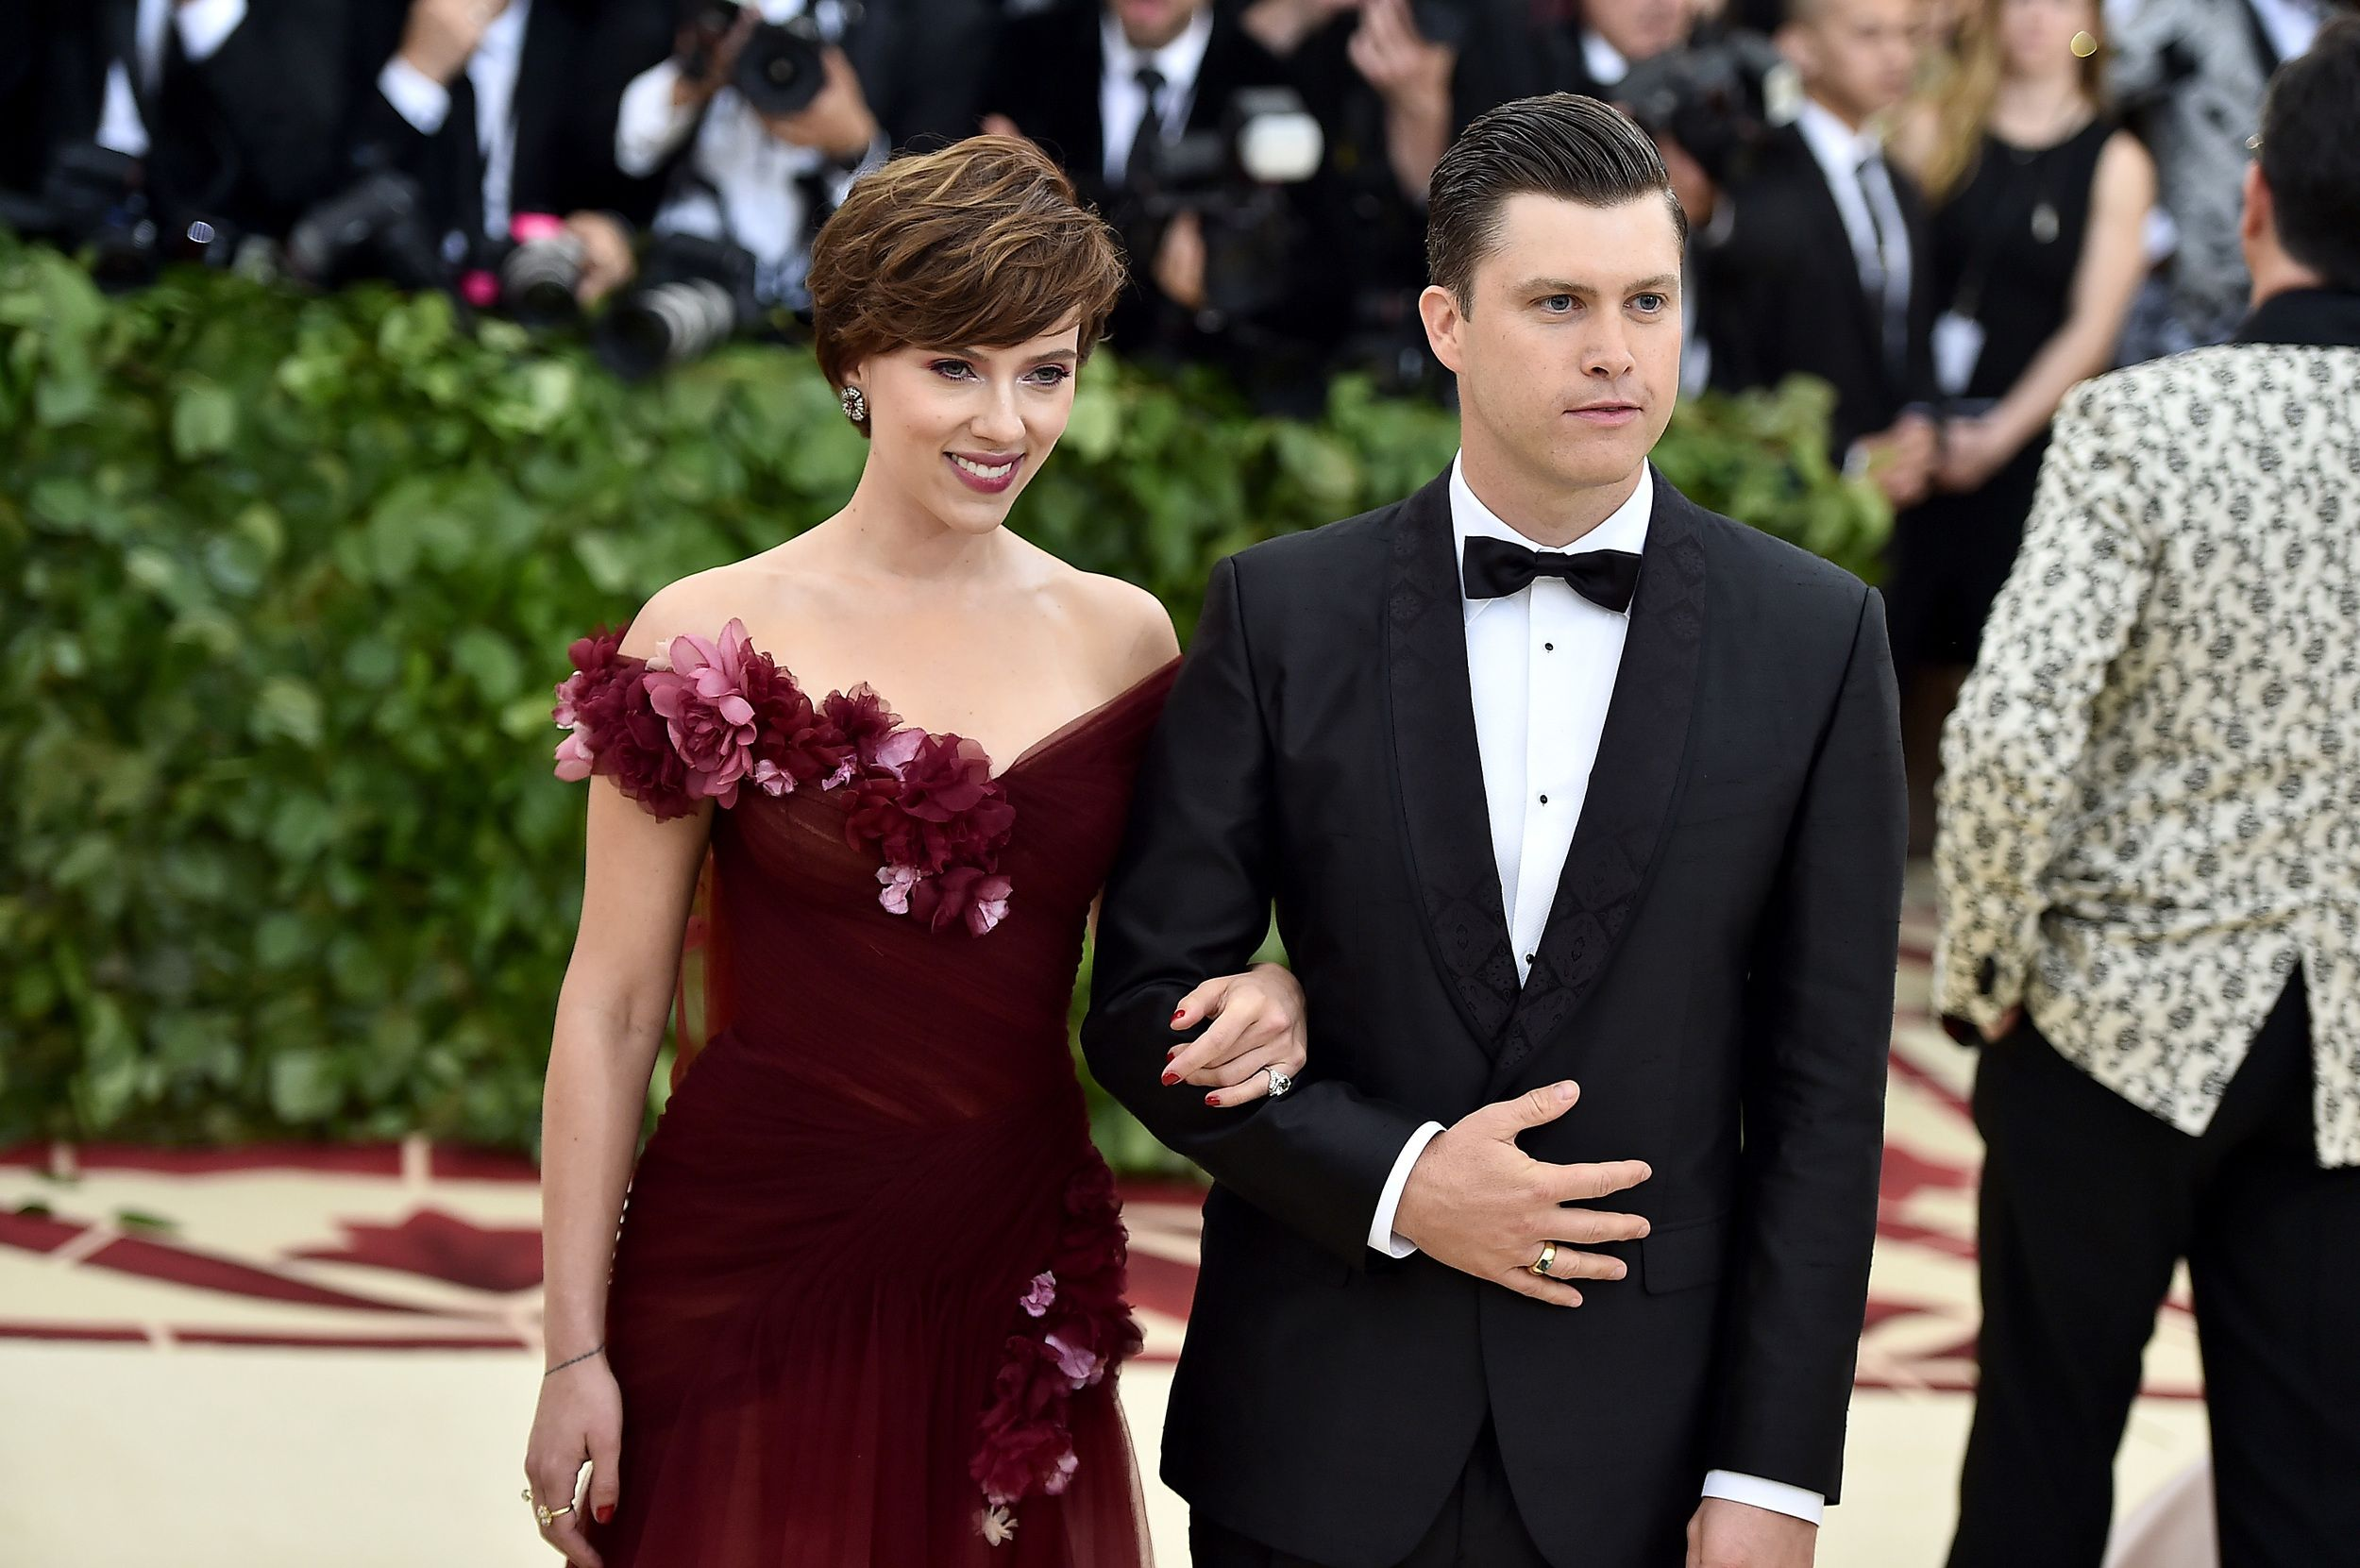 Scarlett Johansson unveils massive engagement ring from